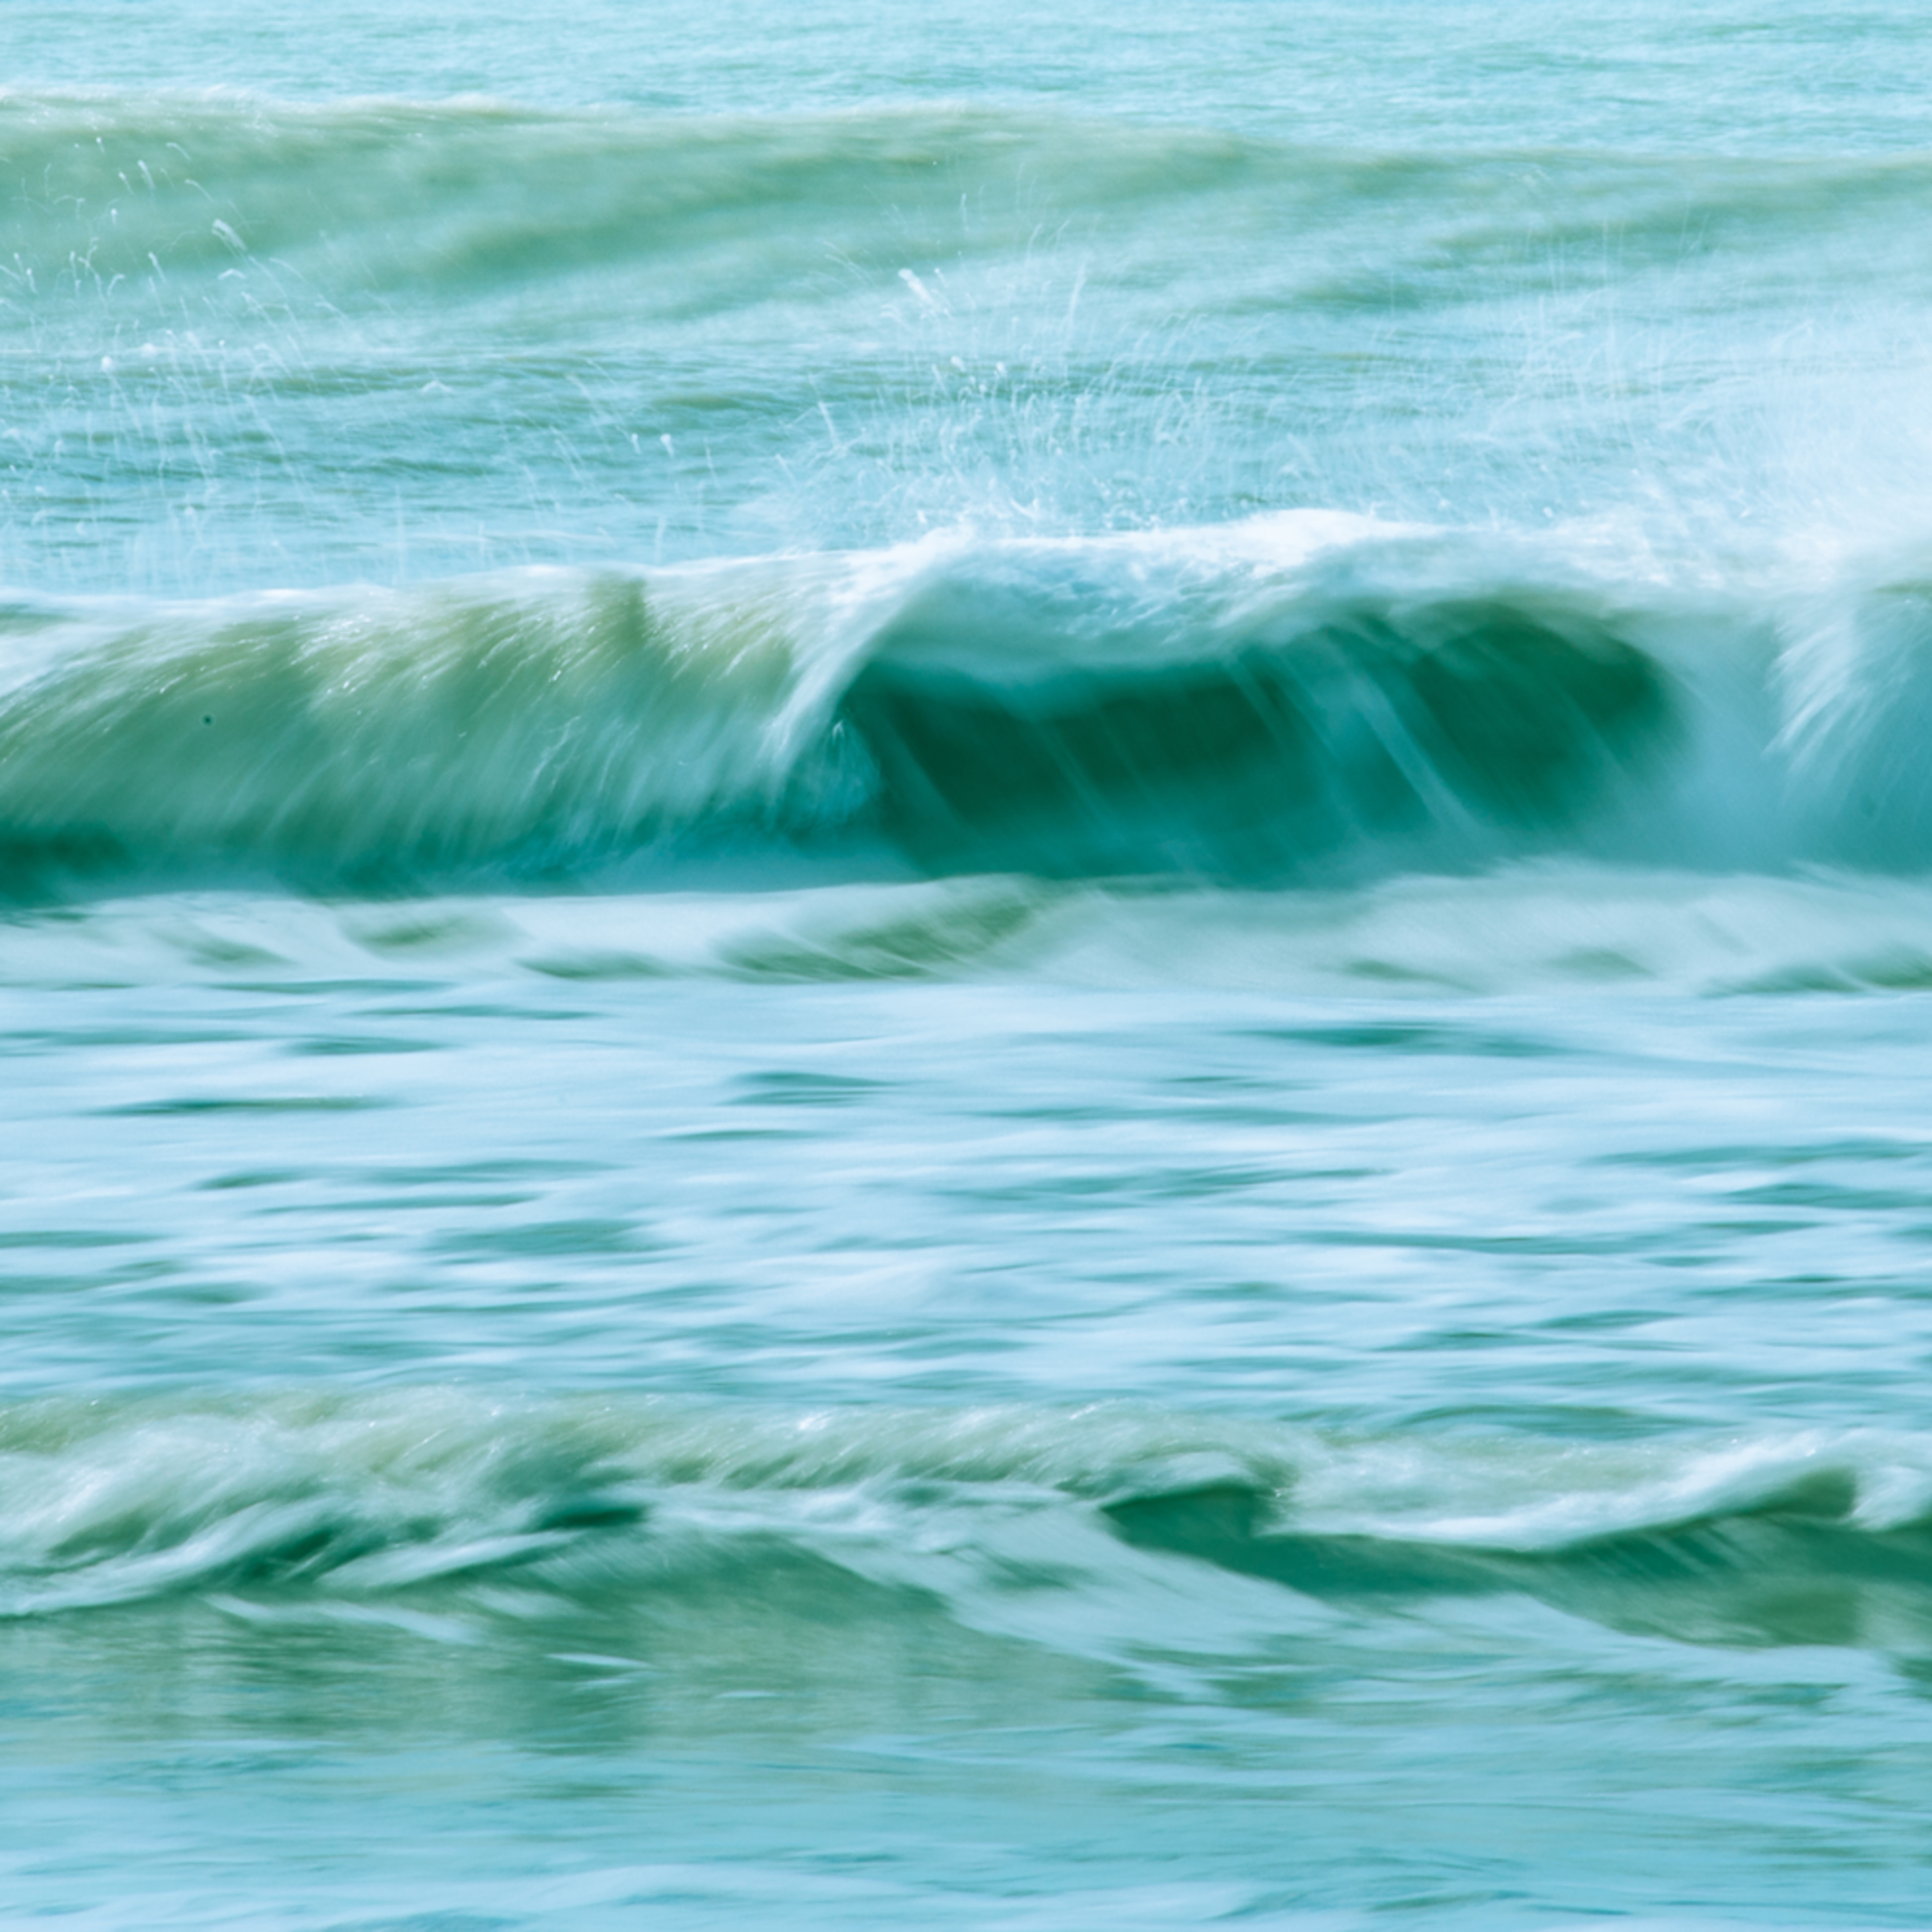 Wave 07 ozy0da